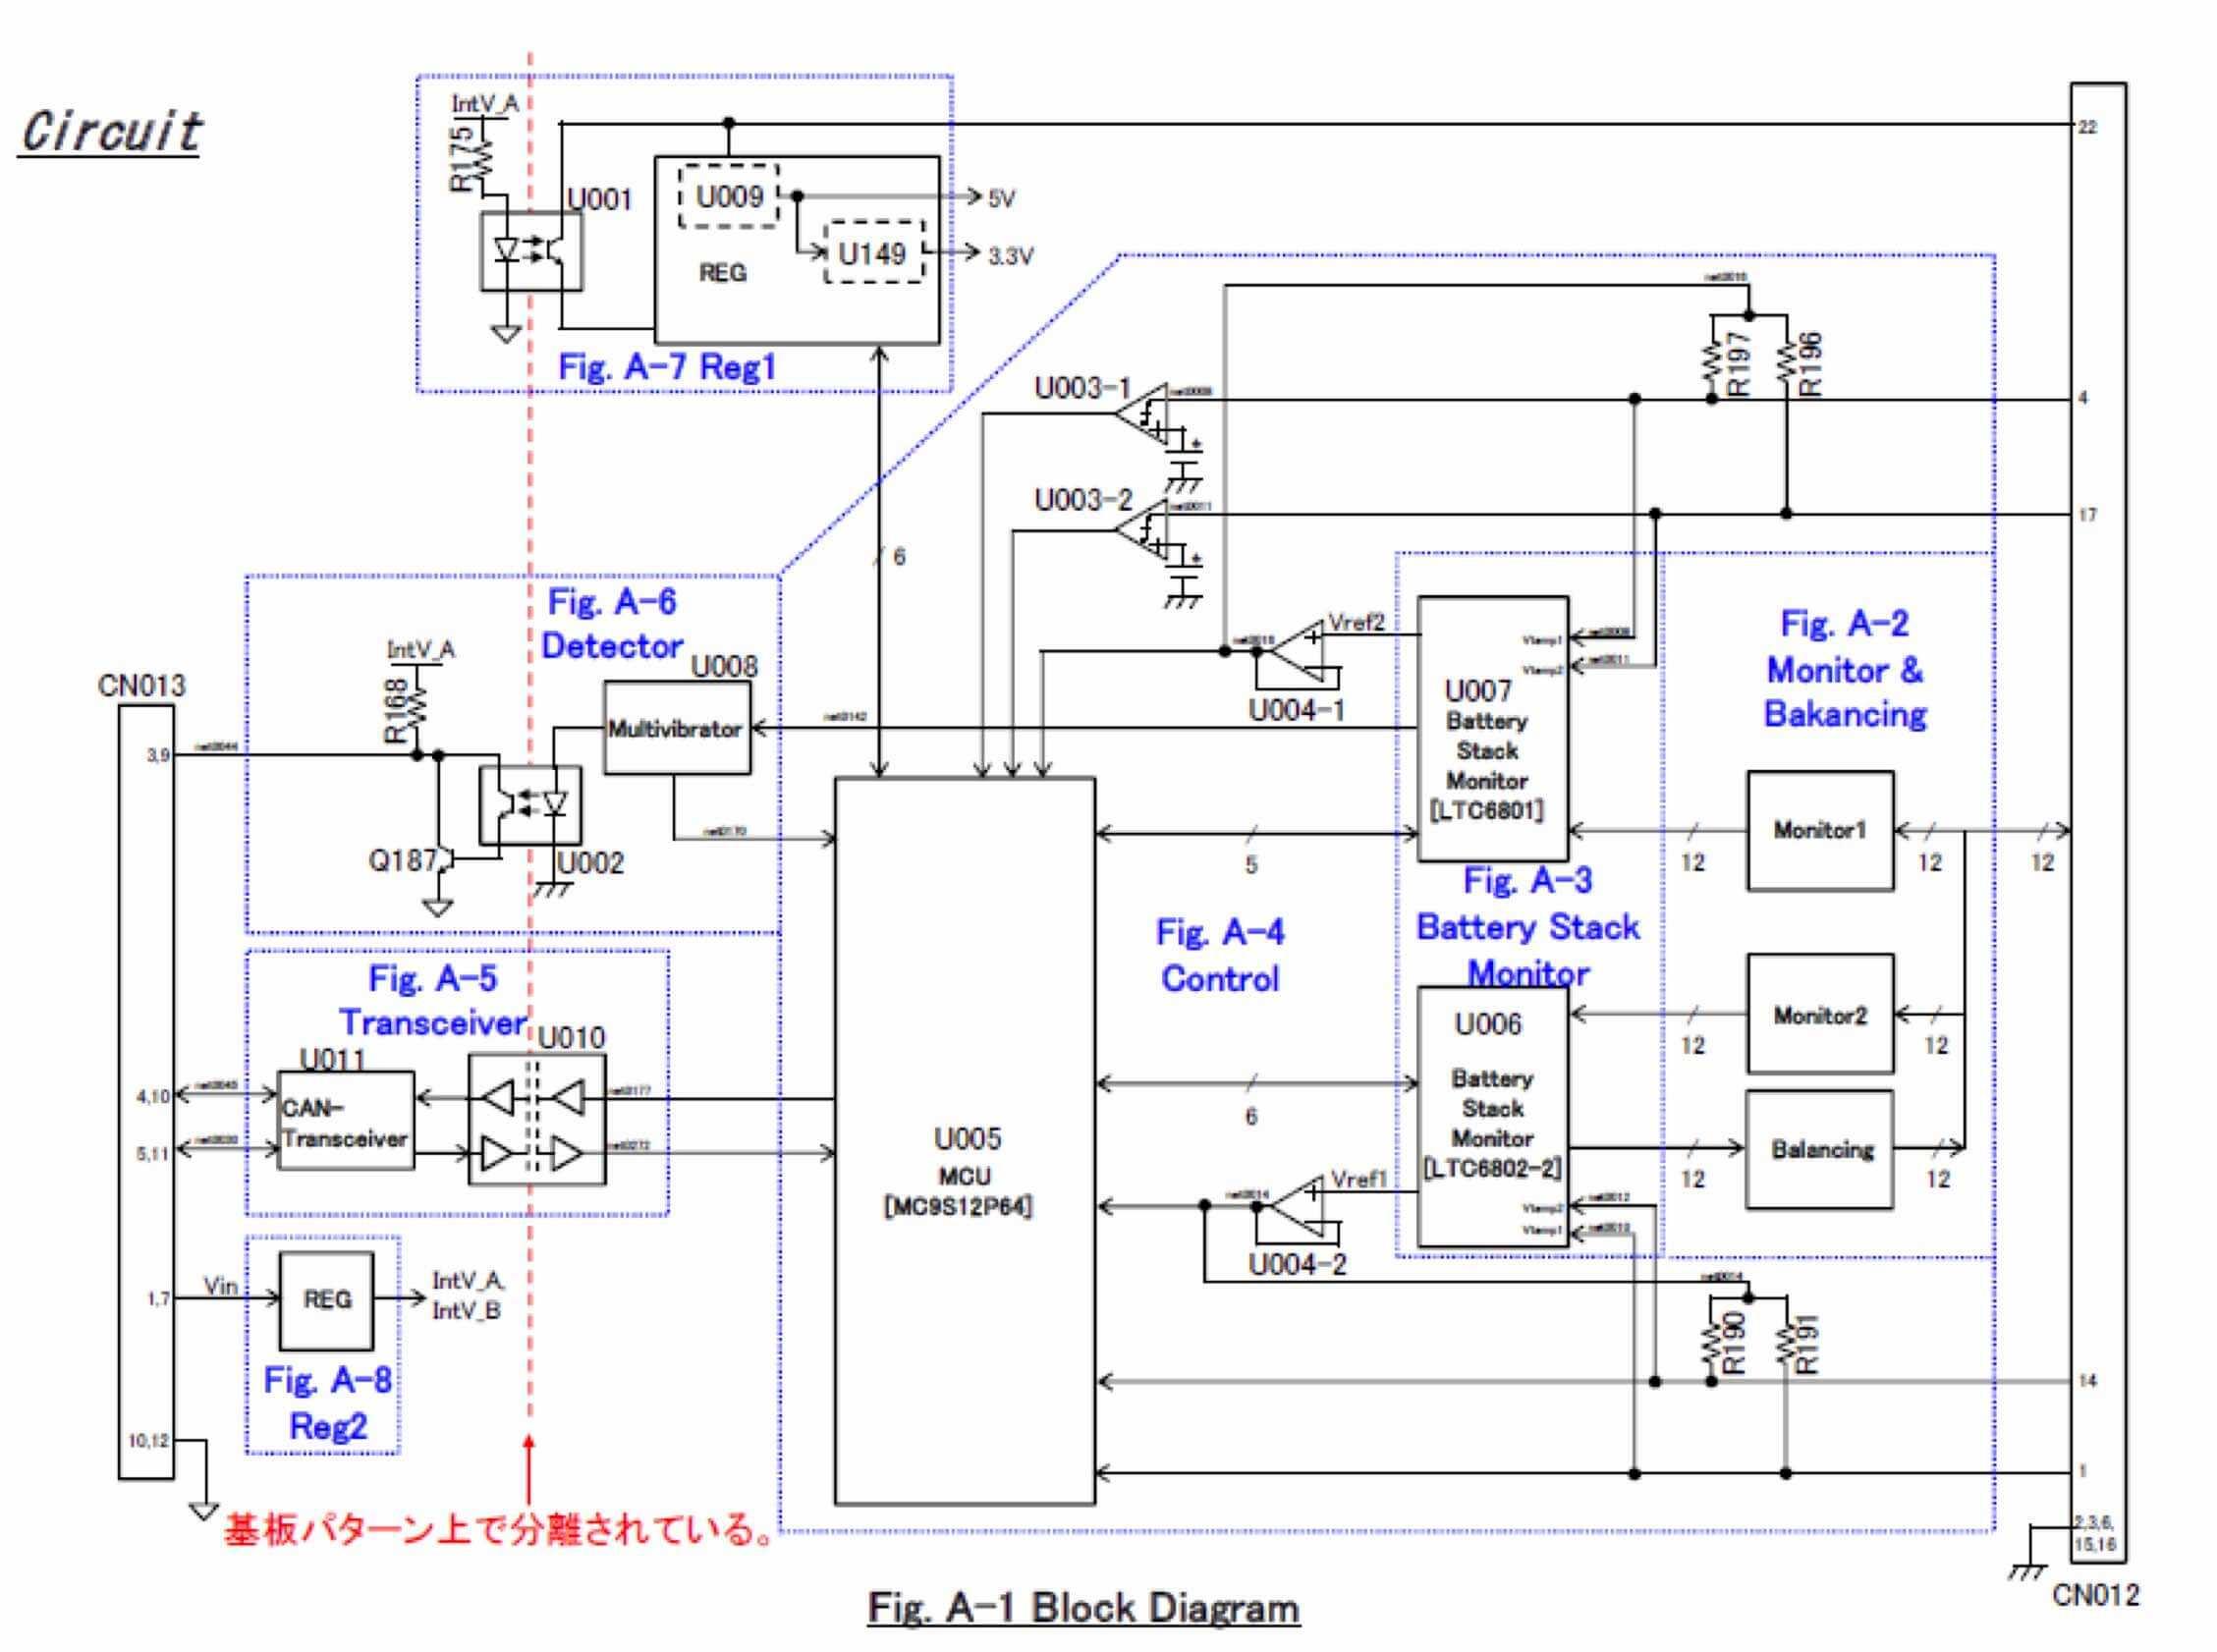 Schumacher Battery Charger Wiring Diagram Scwam Se 1520 Psw Circuit Diagramhtml Symbols